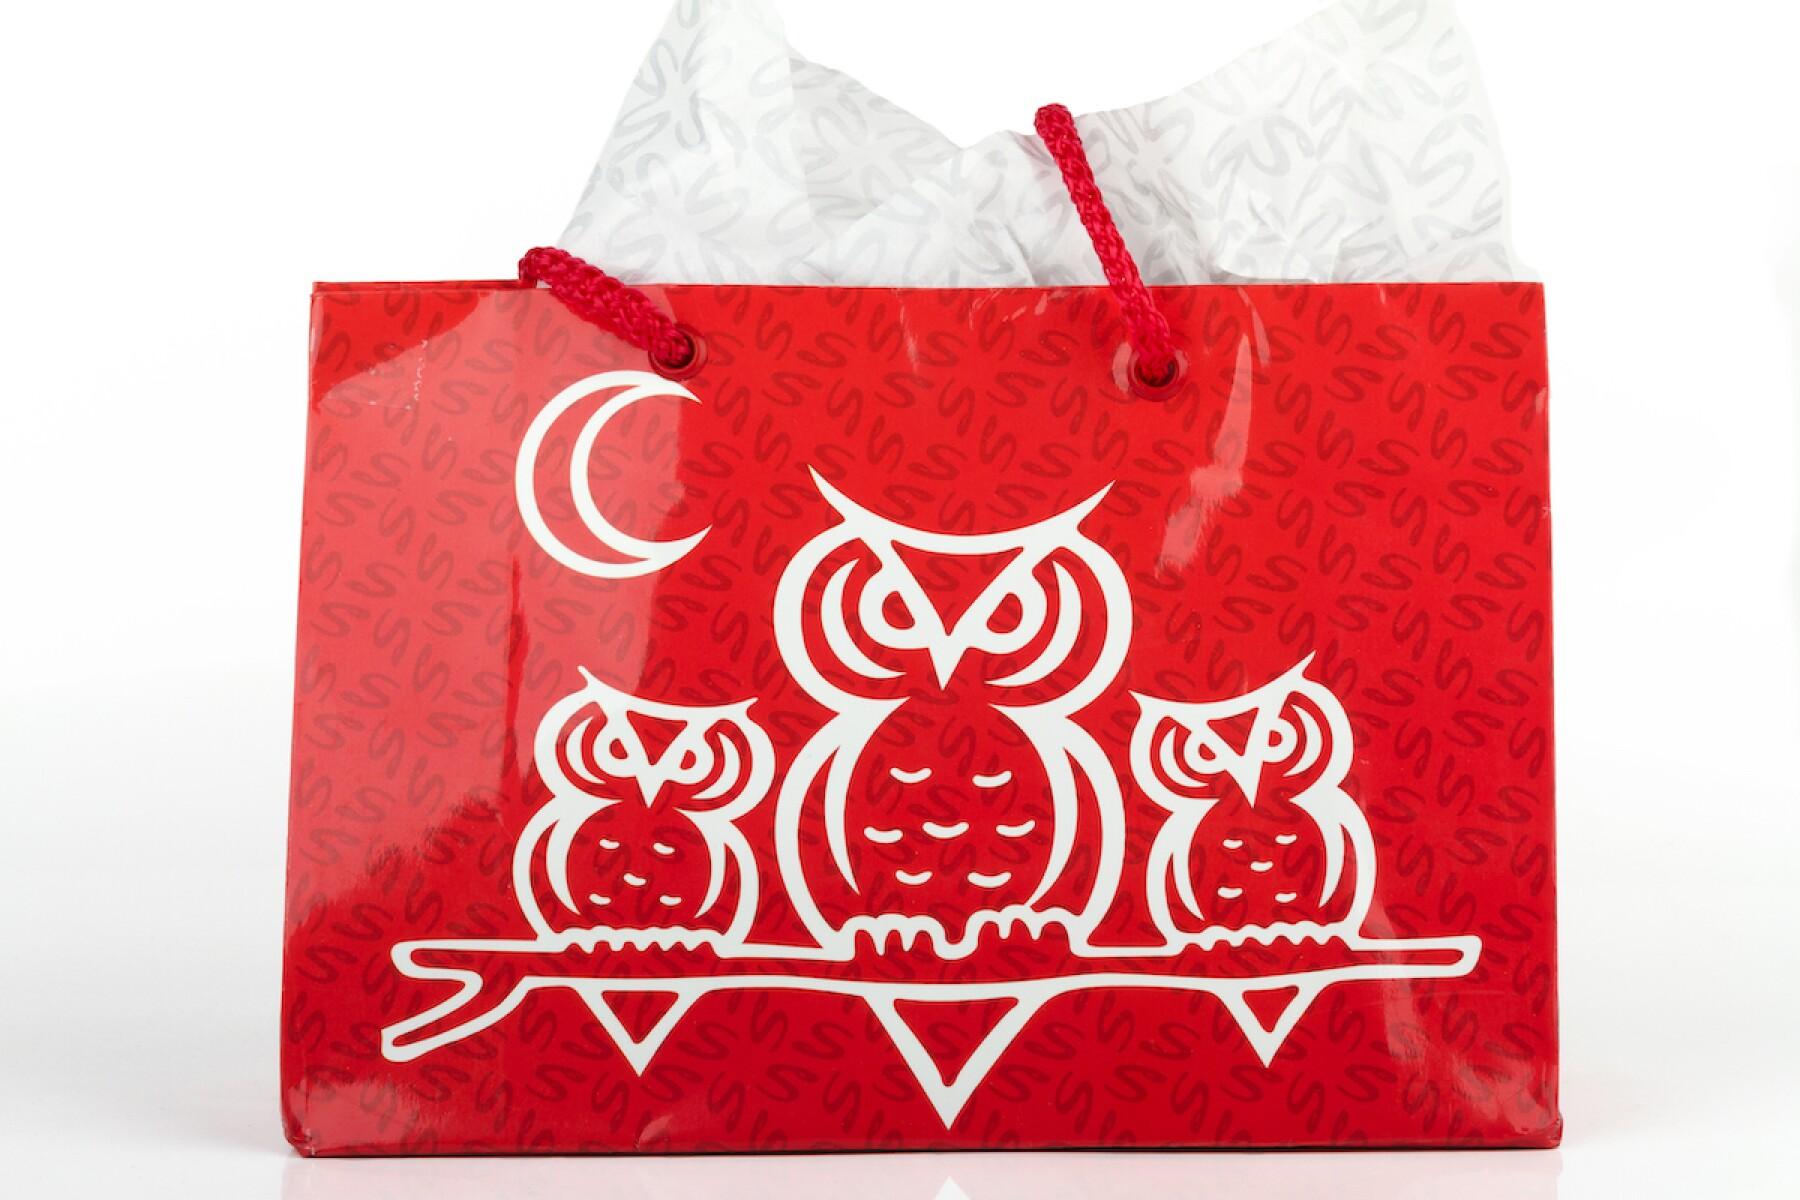 Sanborns gift bag